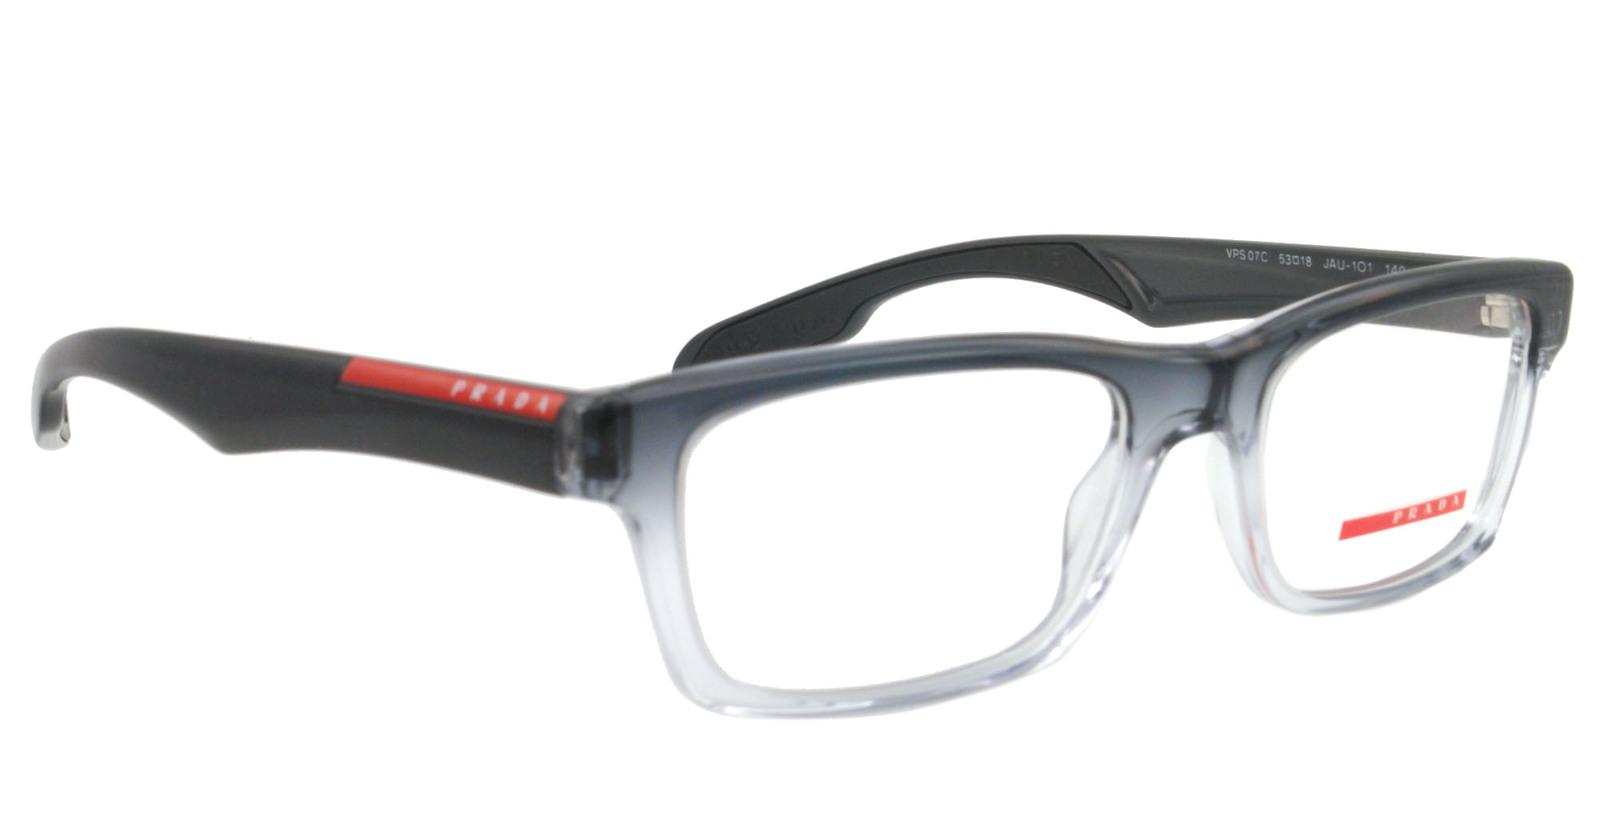 2a5b95ad6322 promo code for image 1 of 2. new unisex prada vps 07c glasses 311ac ea1ac